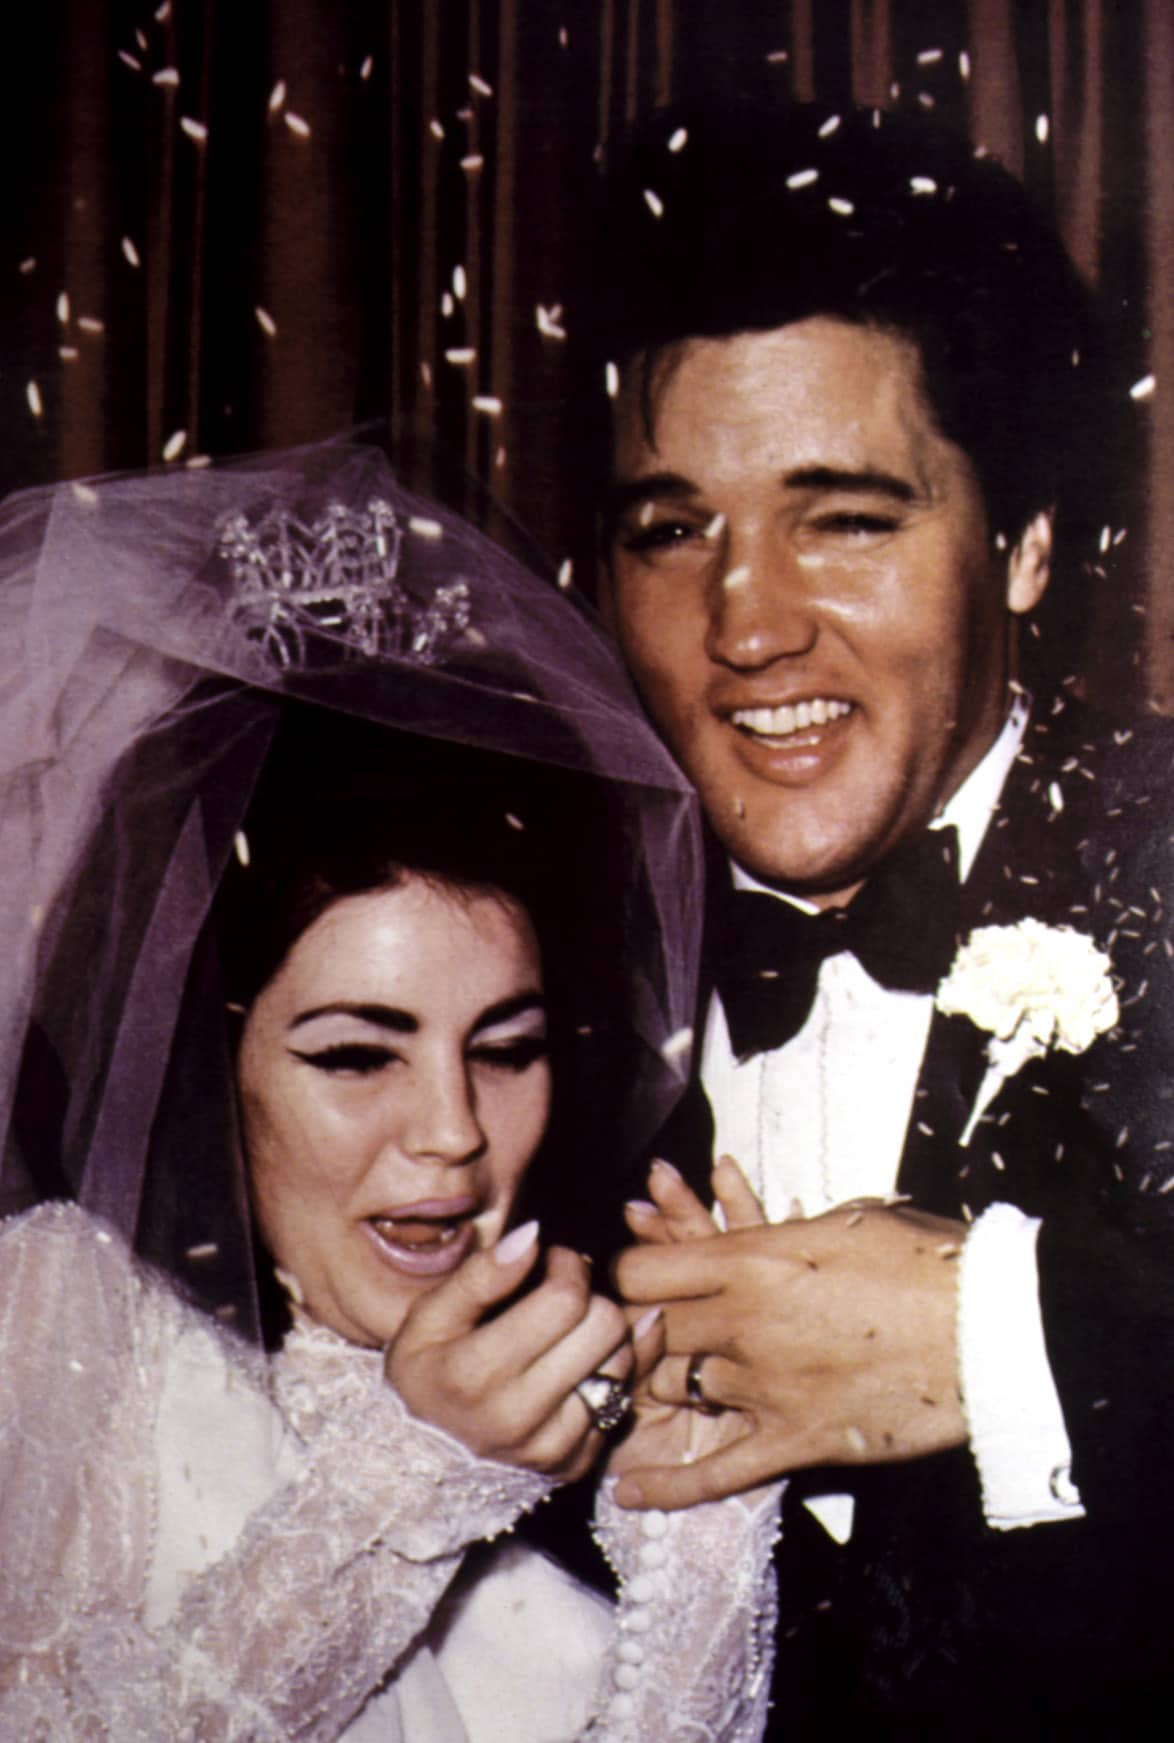 Newlyweds PRISCILLA PRESLEY and ELVIS PRESLEY